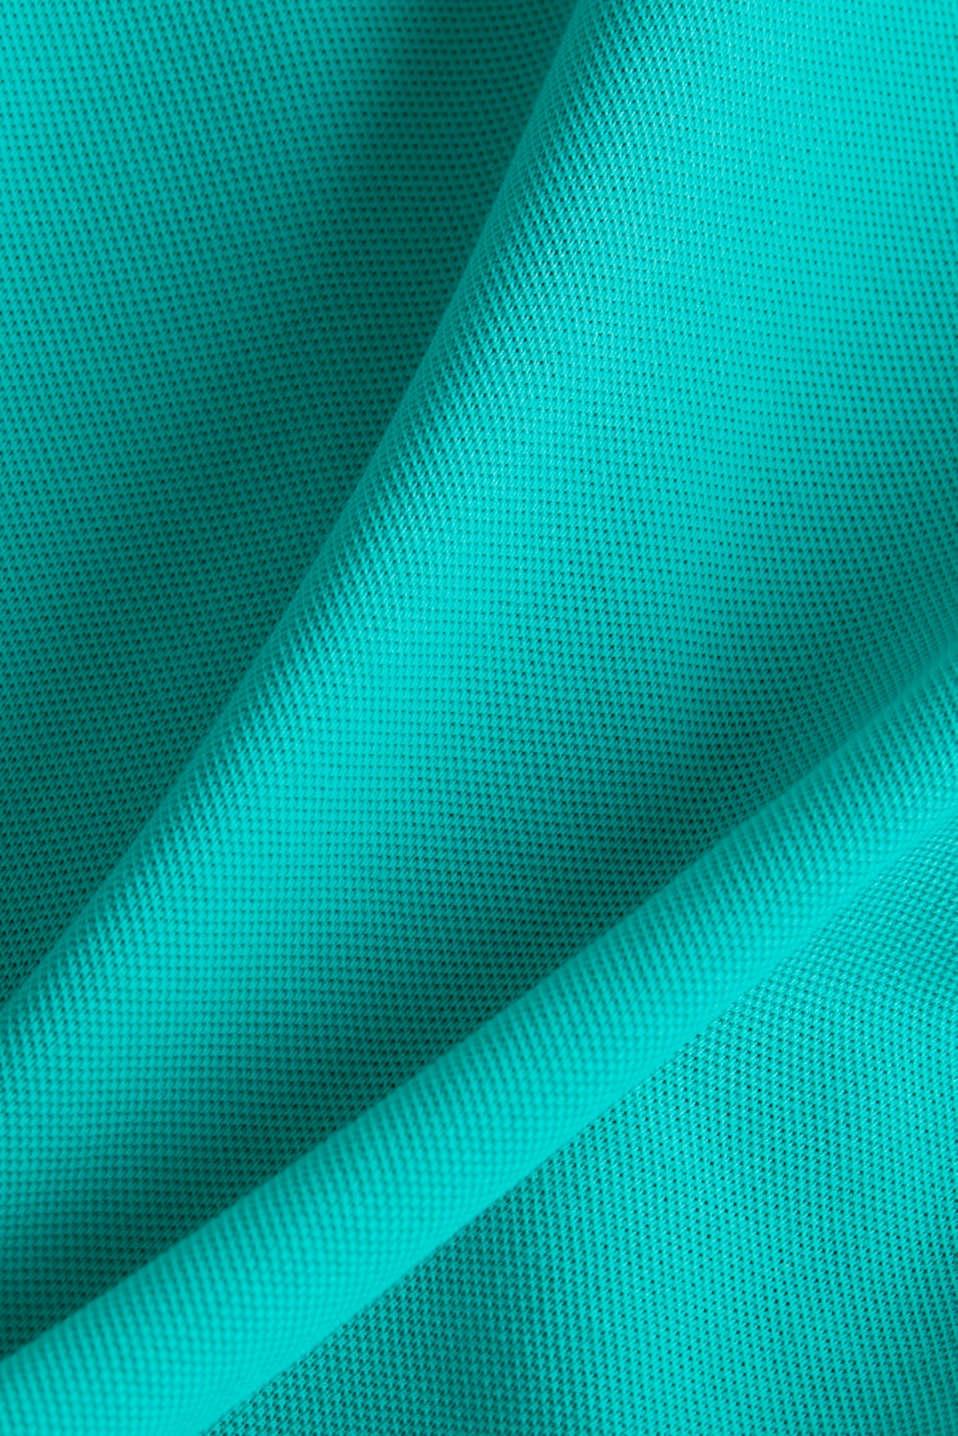 Piqué polo shirt in 100% cotton, AQUA GREEN, detail image number 4